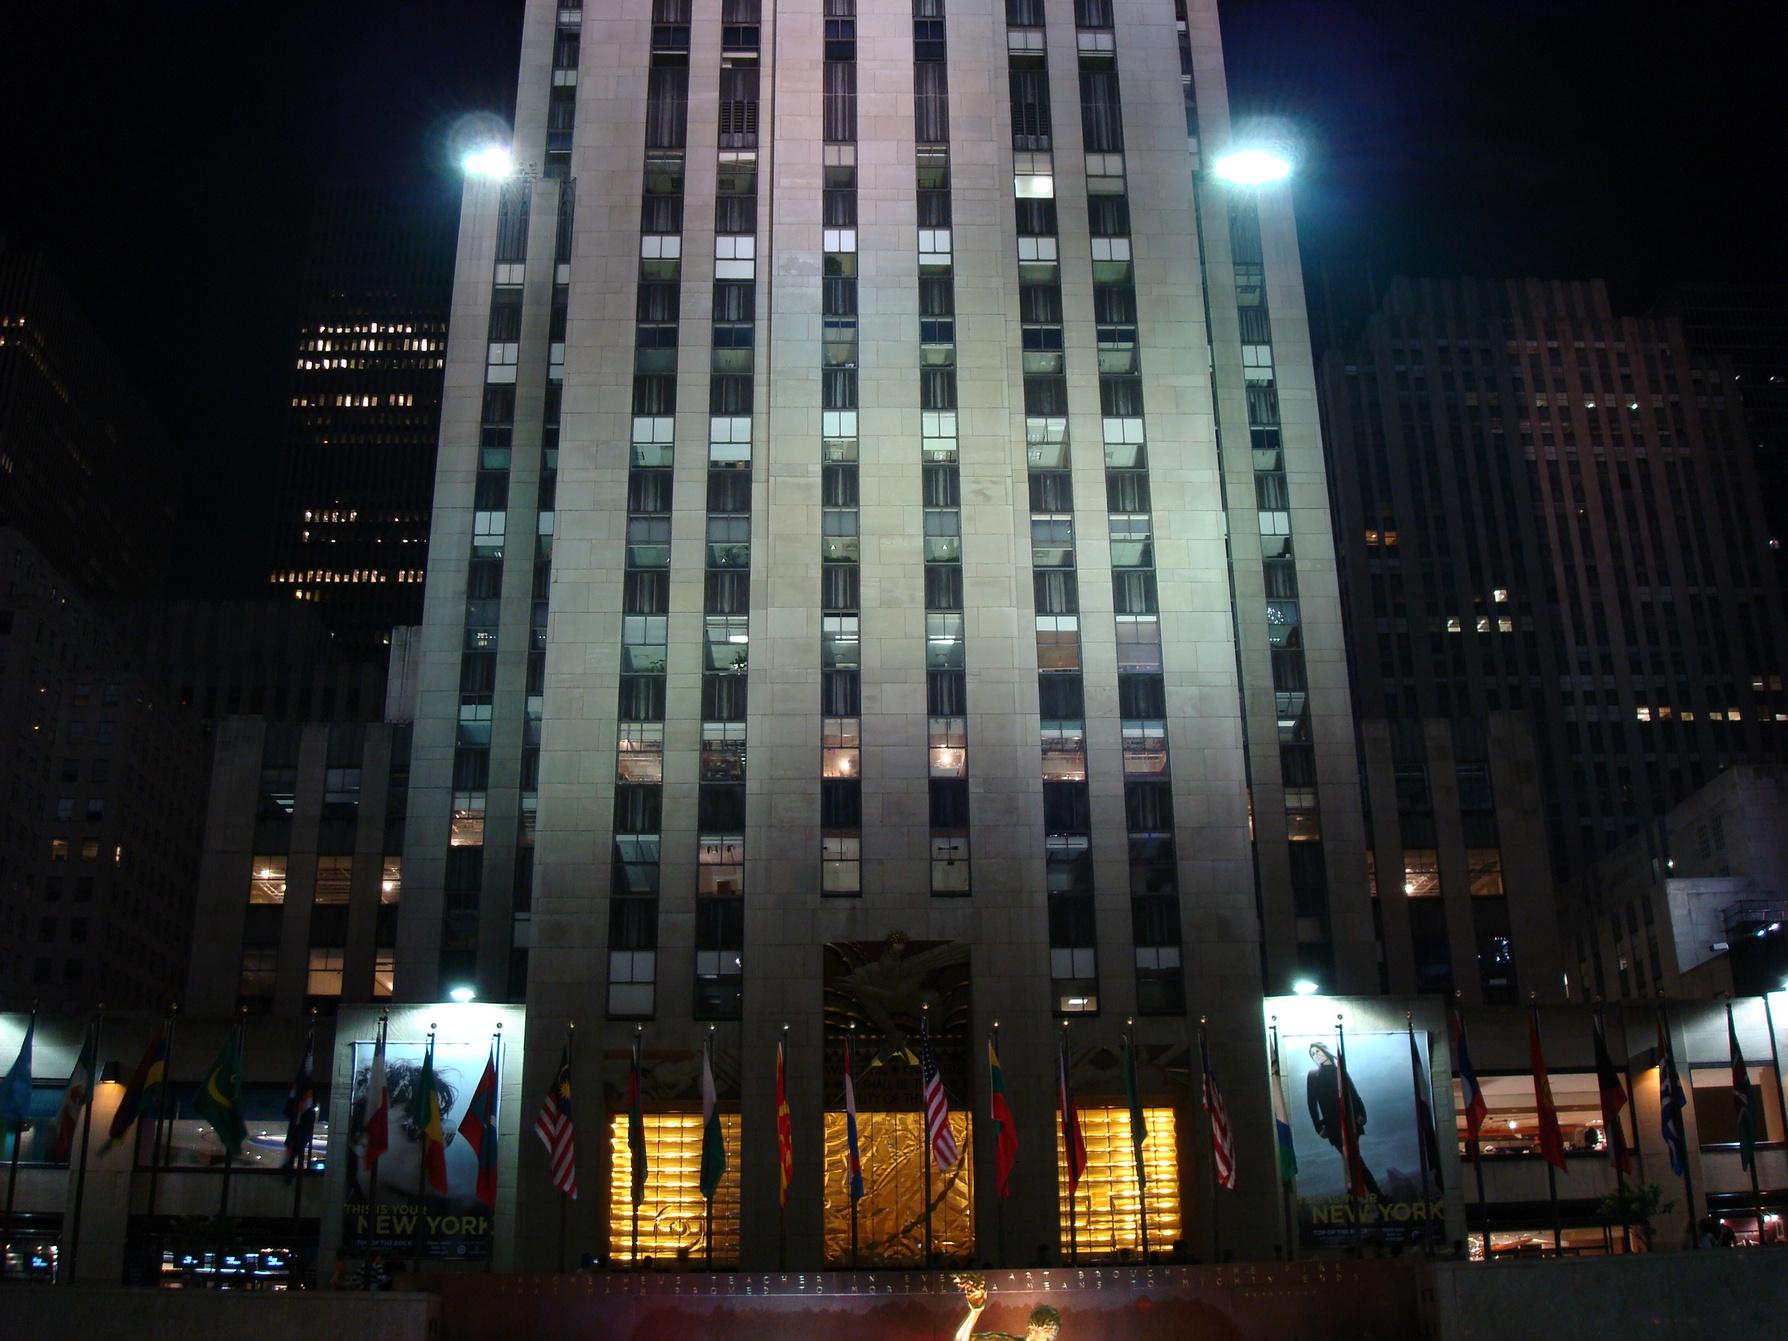 New York City, Manhattan_RockefellerCenterBuilding_CloseShot_AmazingLights